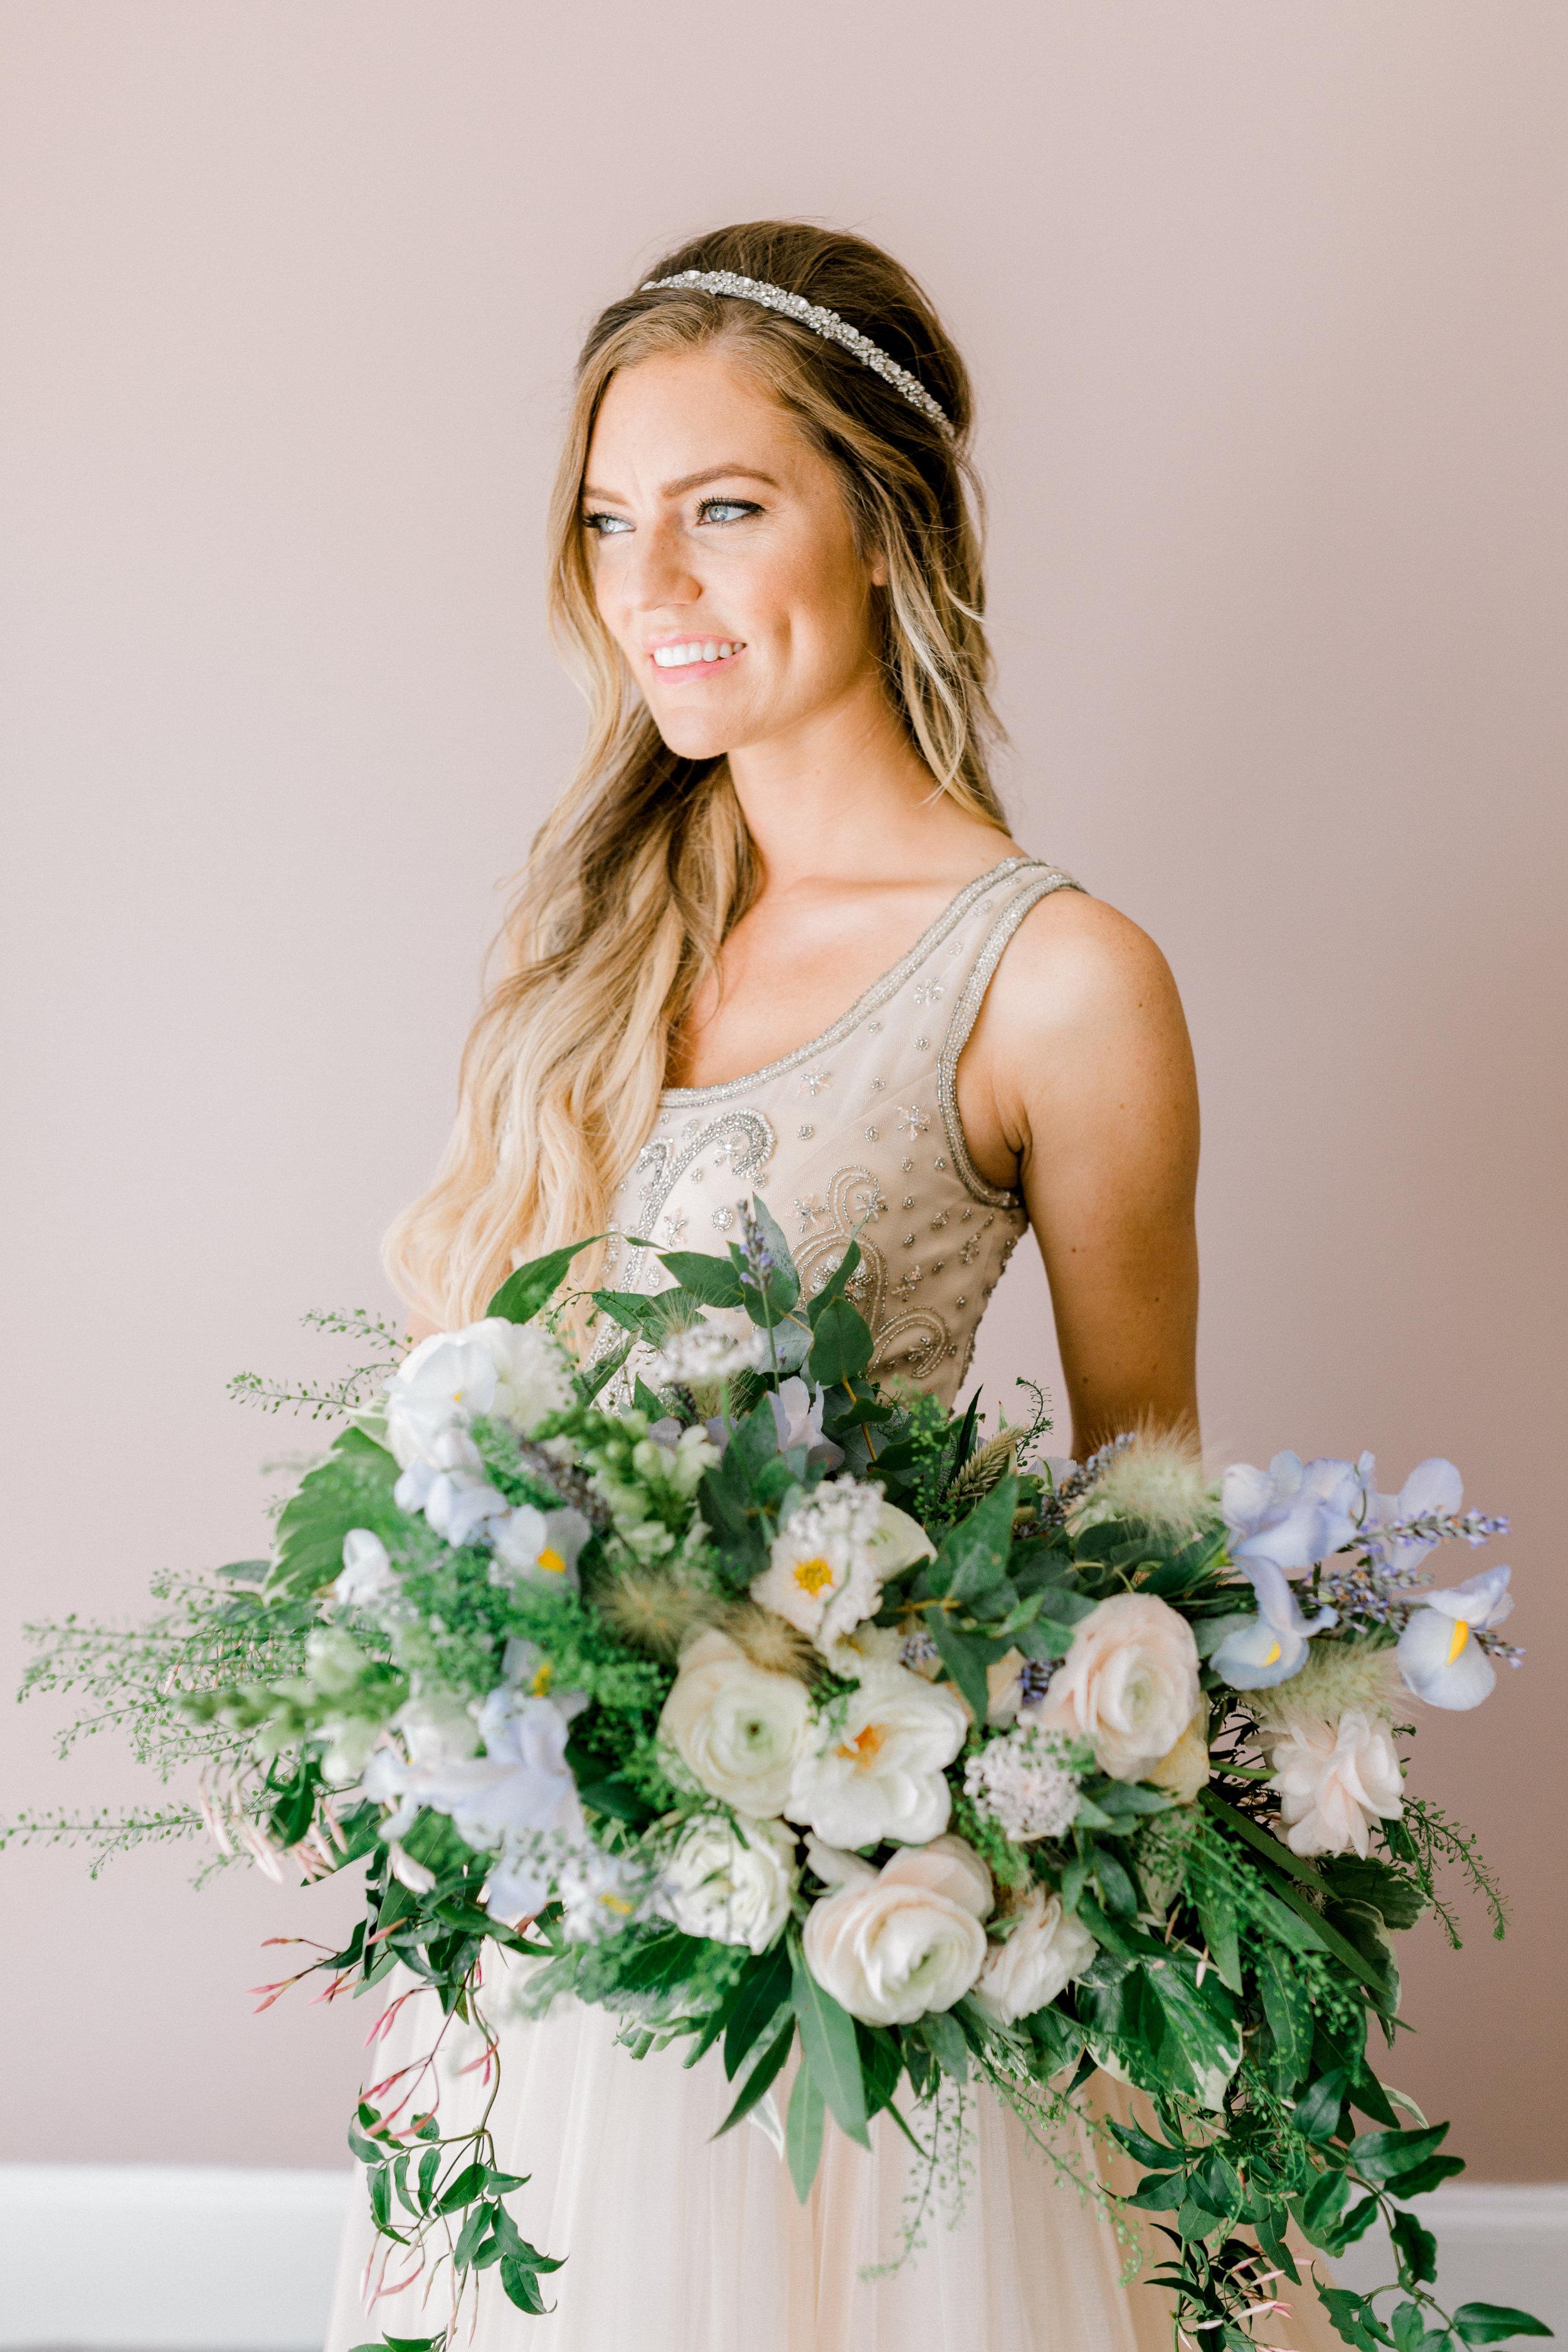 Rochester-MN-Wedding-Photographer-Finery-Boutique-117.jpg